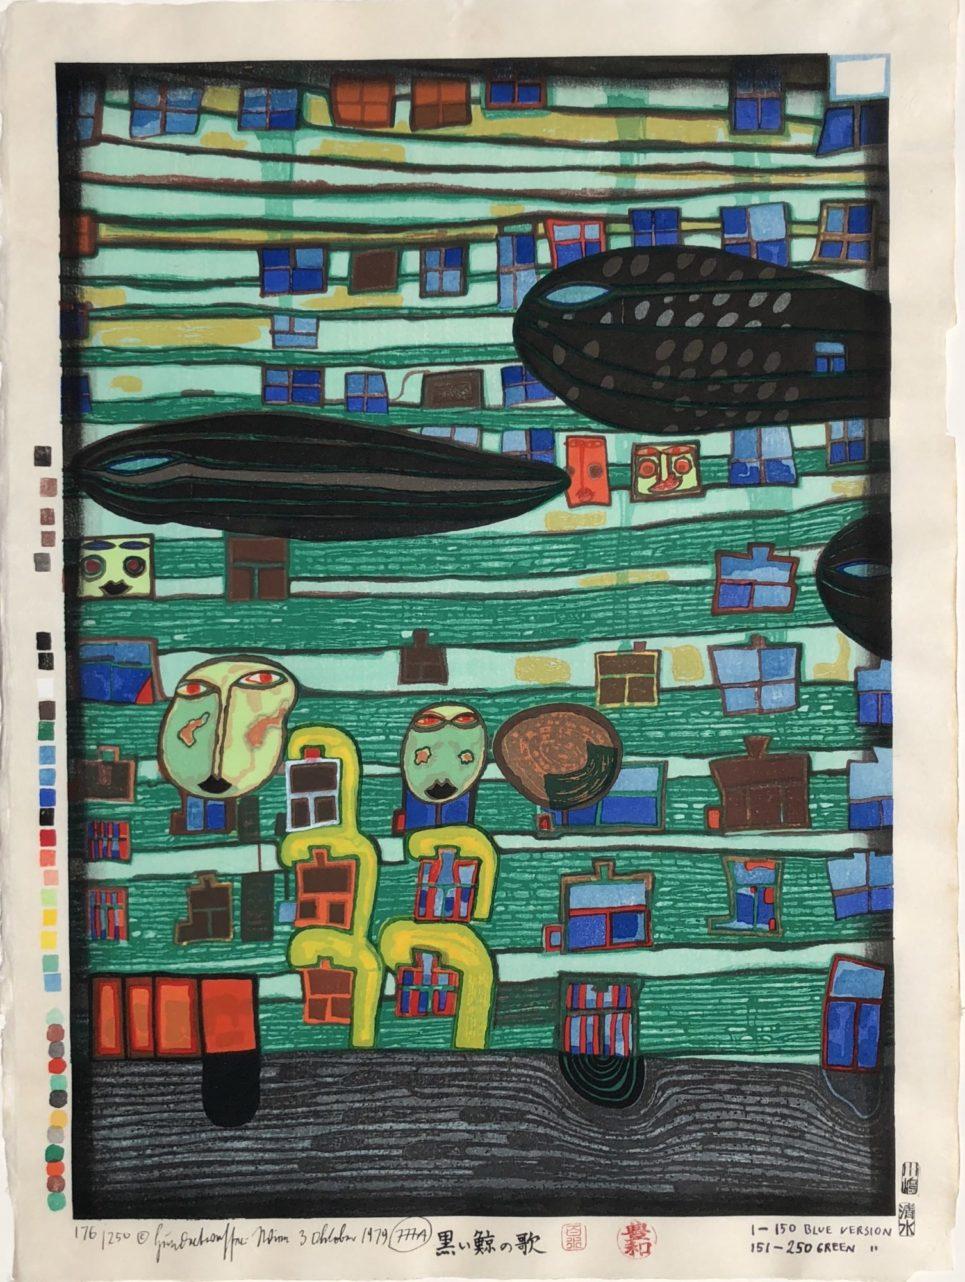 Friedensreich Hundertwasser - Song of the Whales